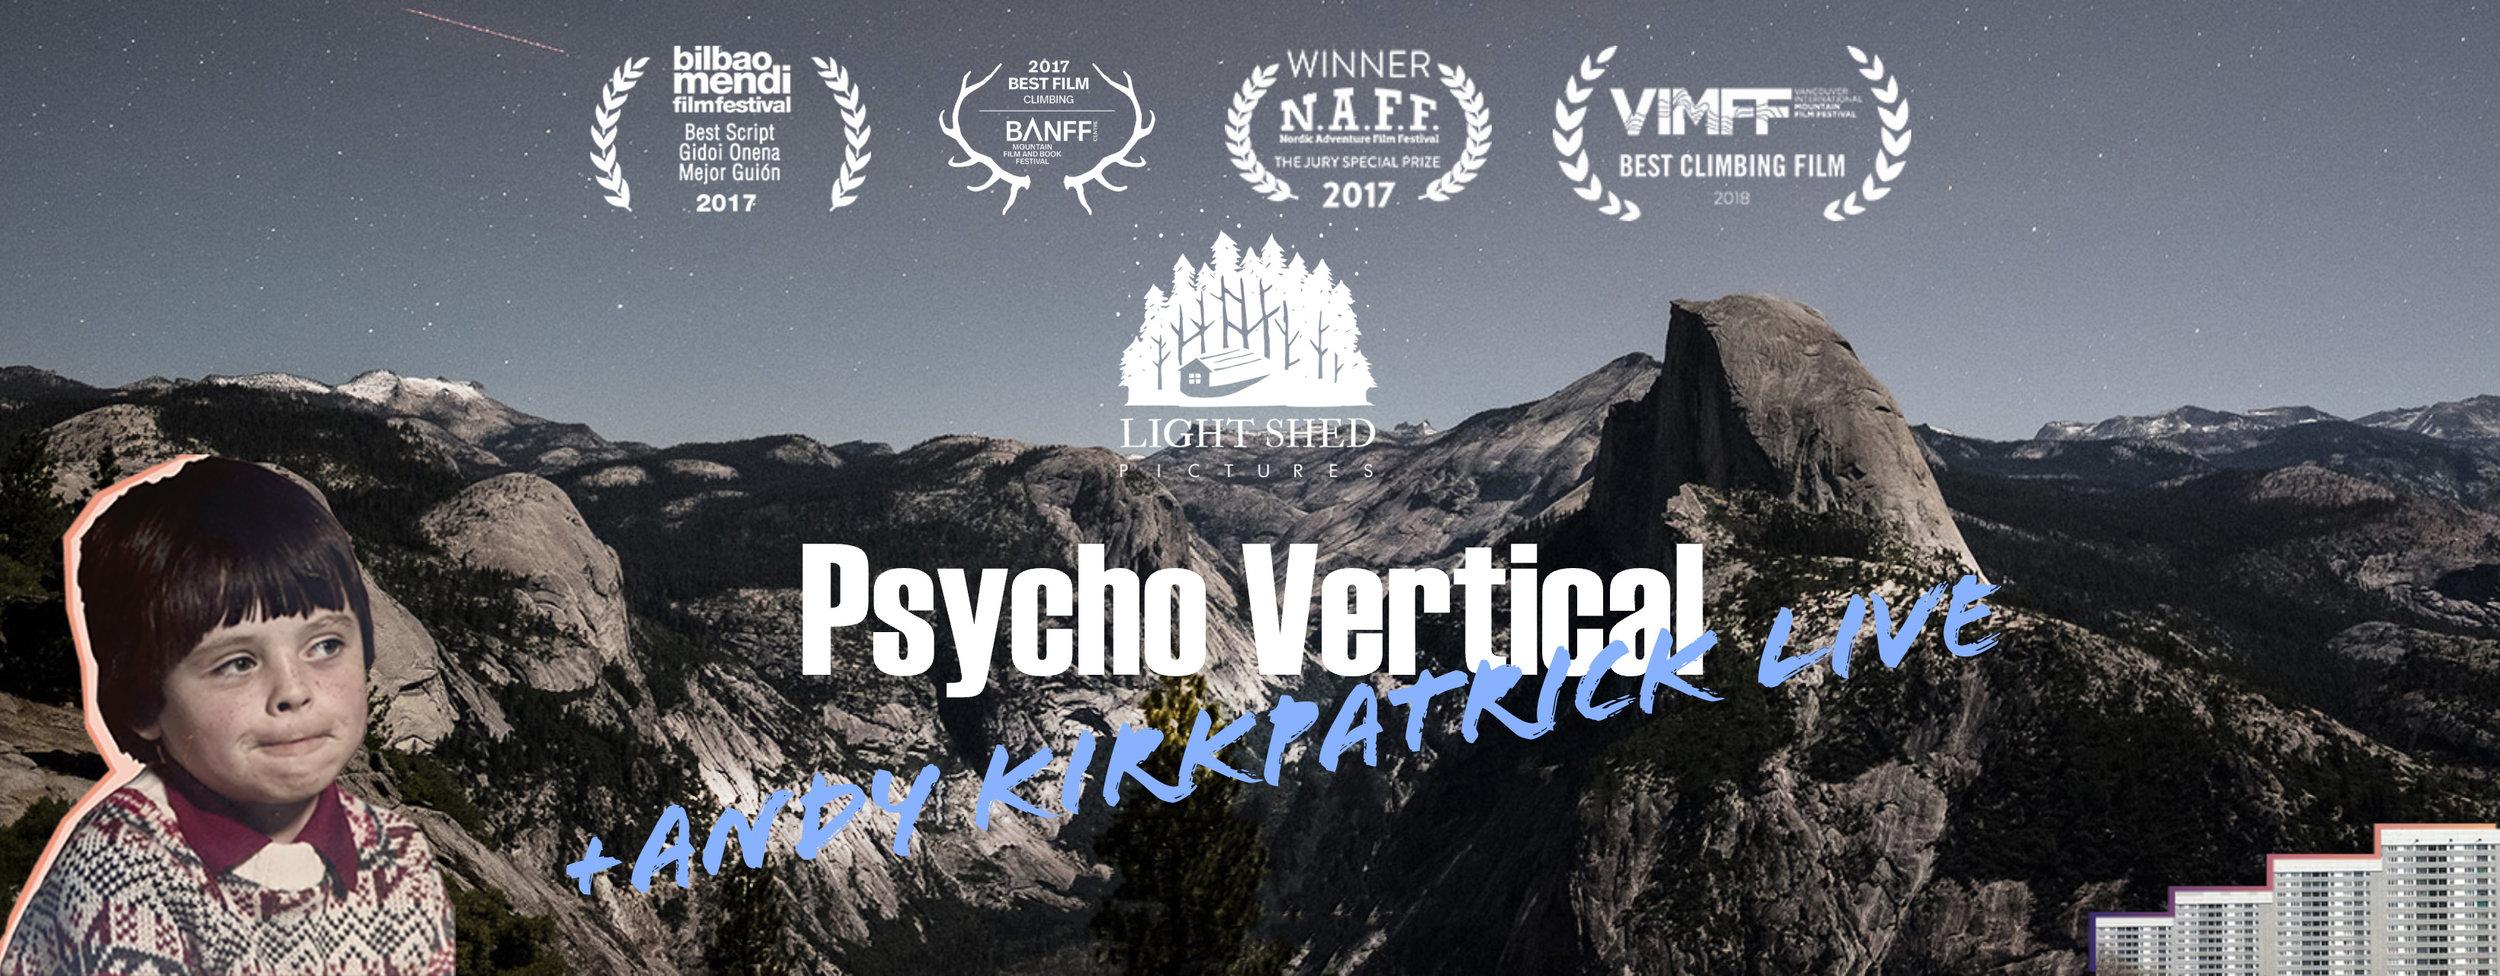 Psycho Vertical Screen.jpg